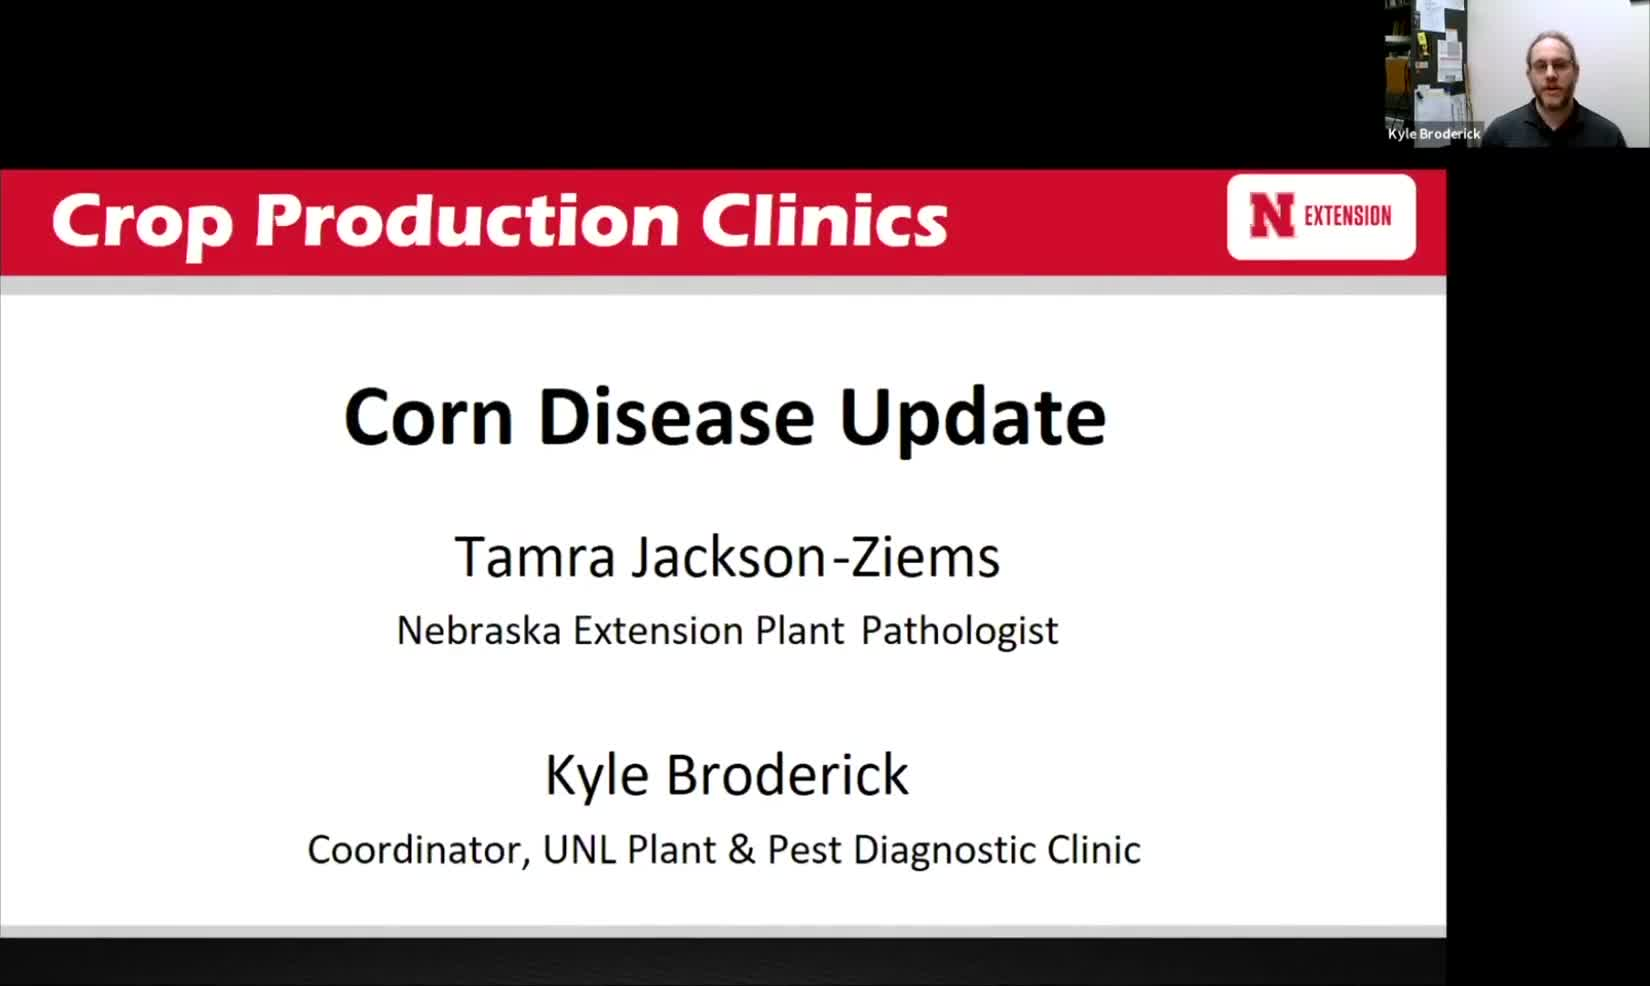 Corn Disease Update